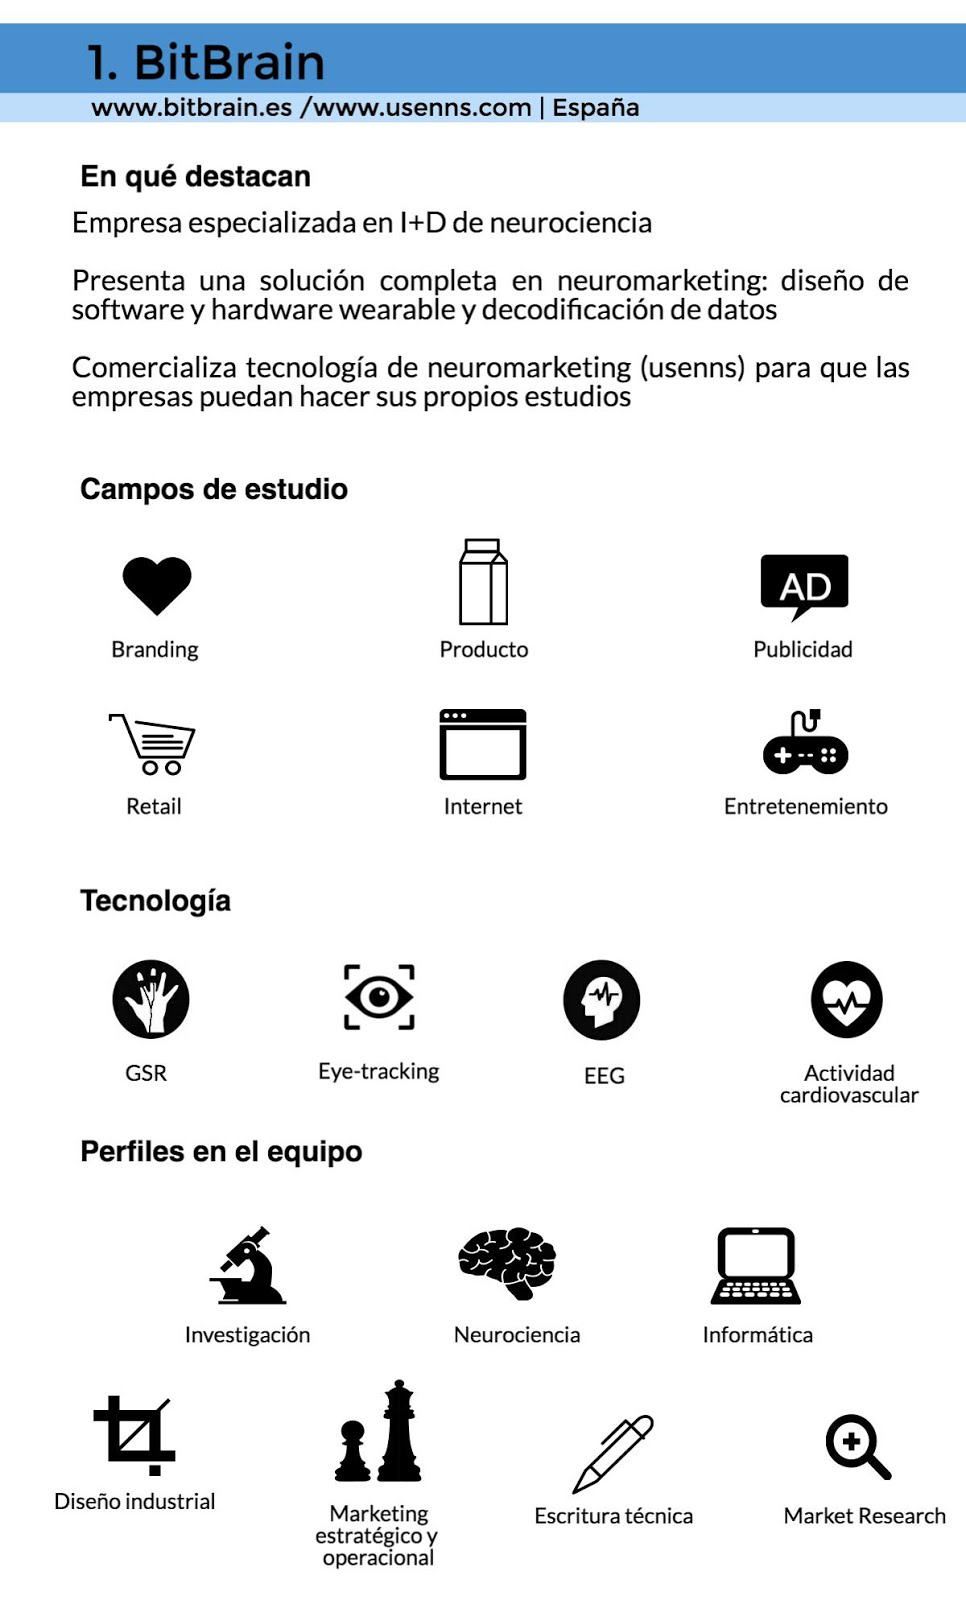 empresas especializadas en neuromarketing